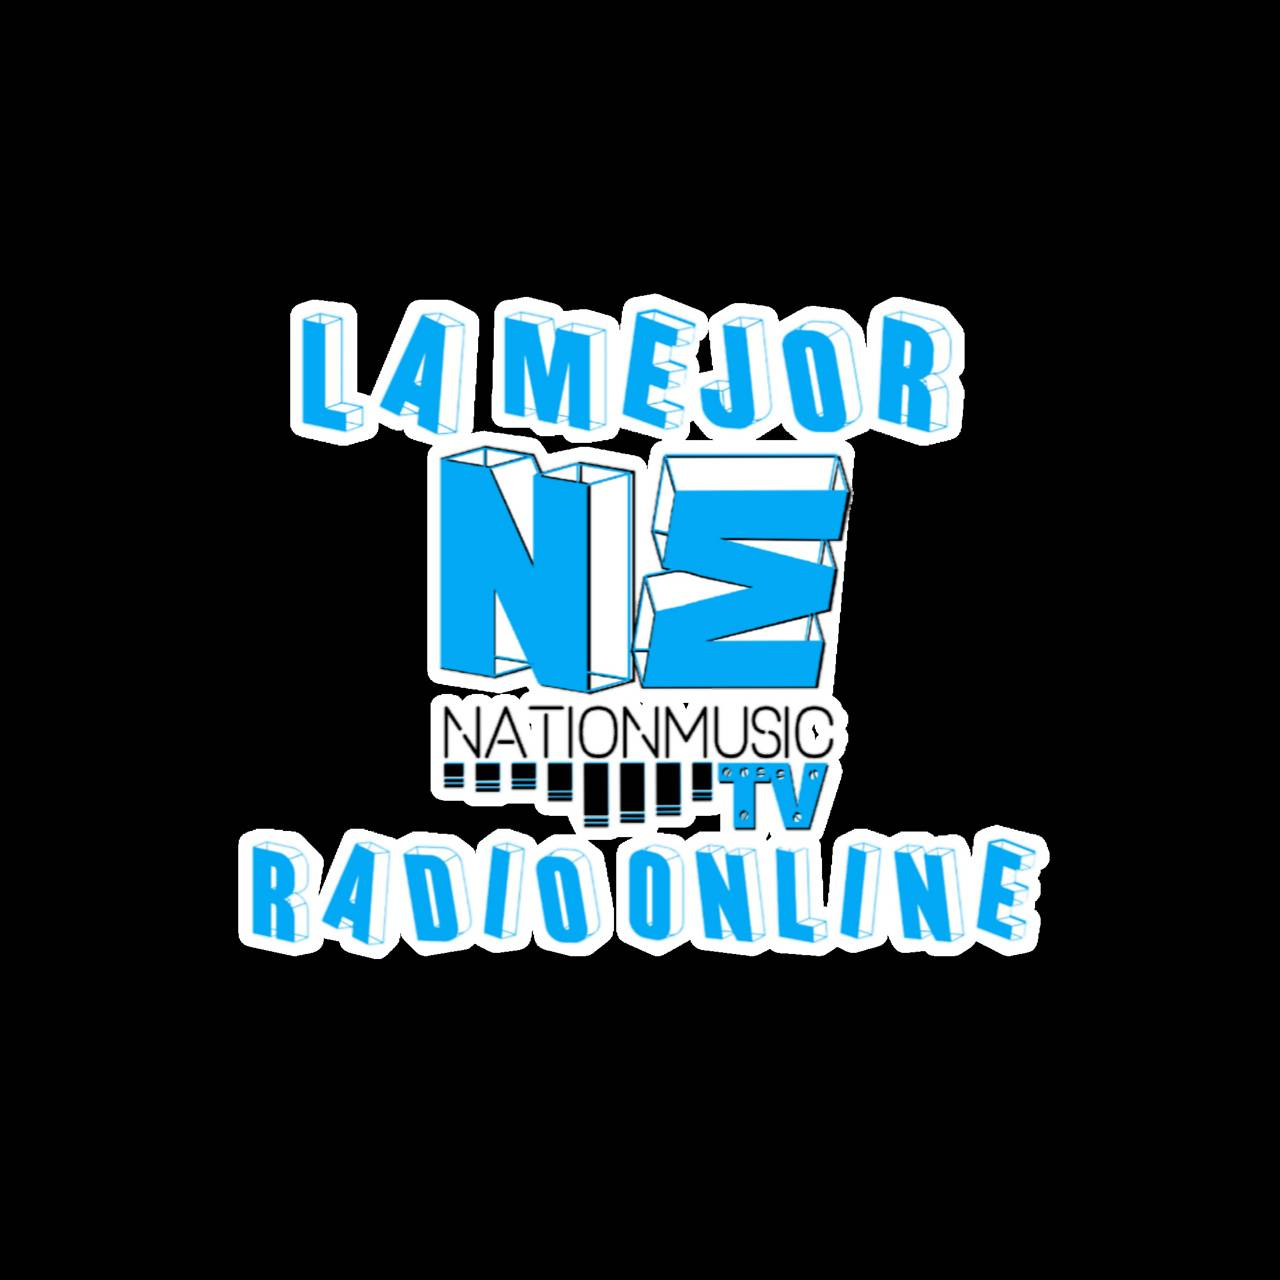 NationMusic tv